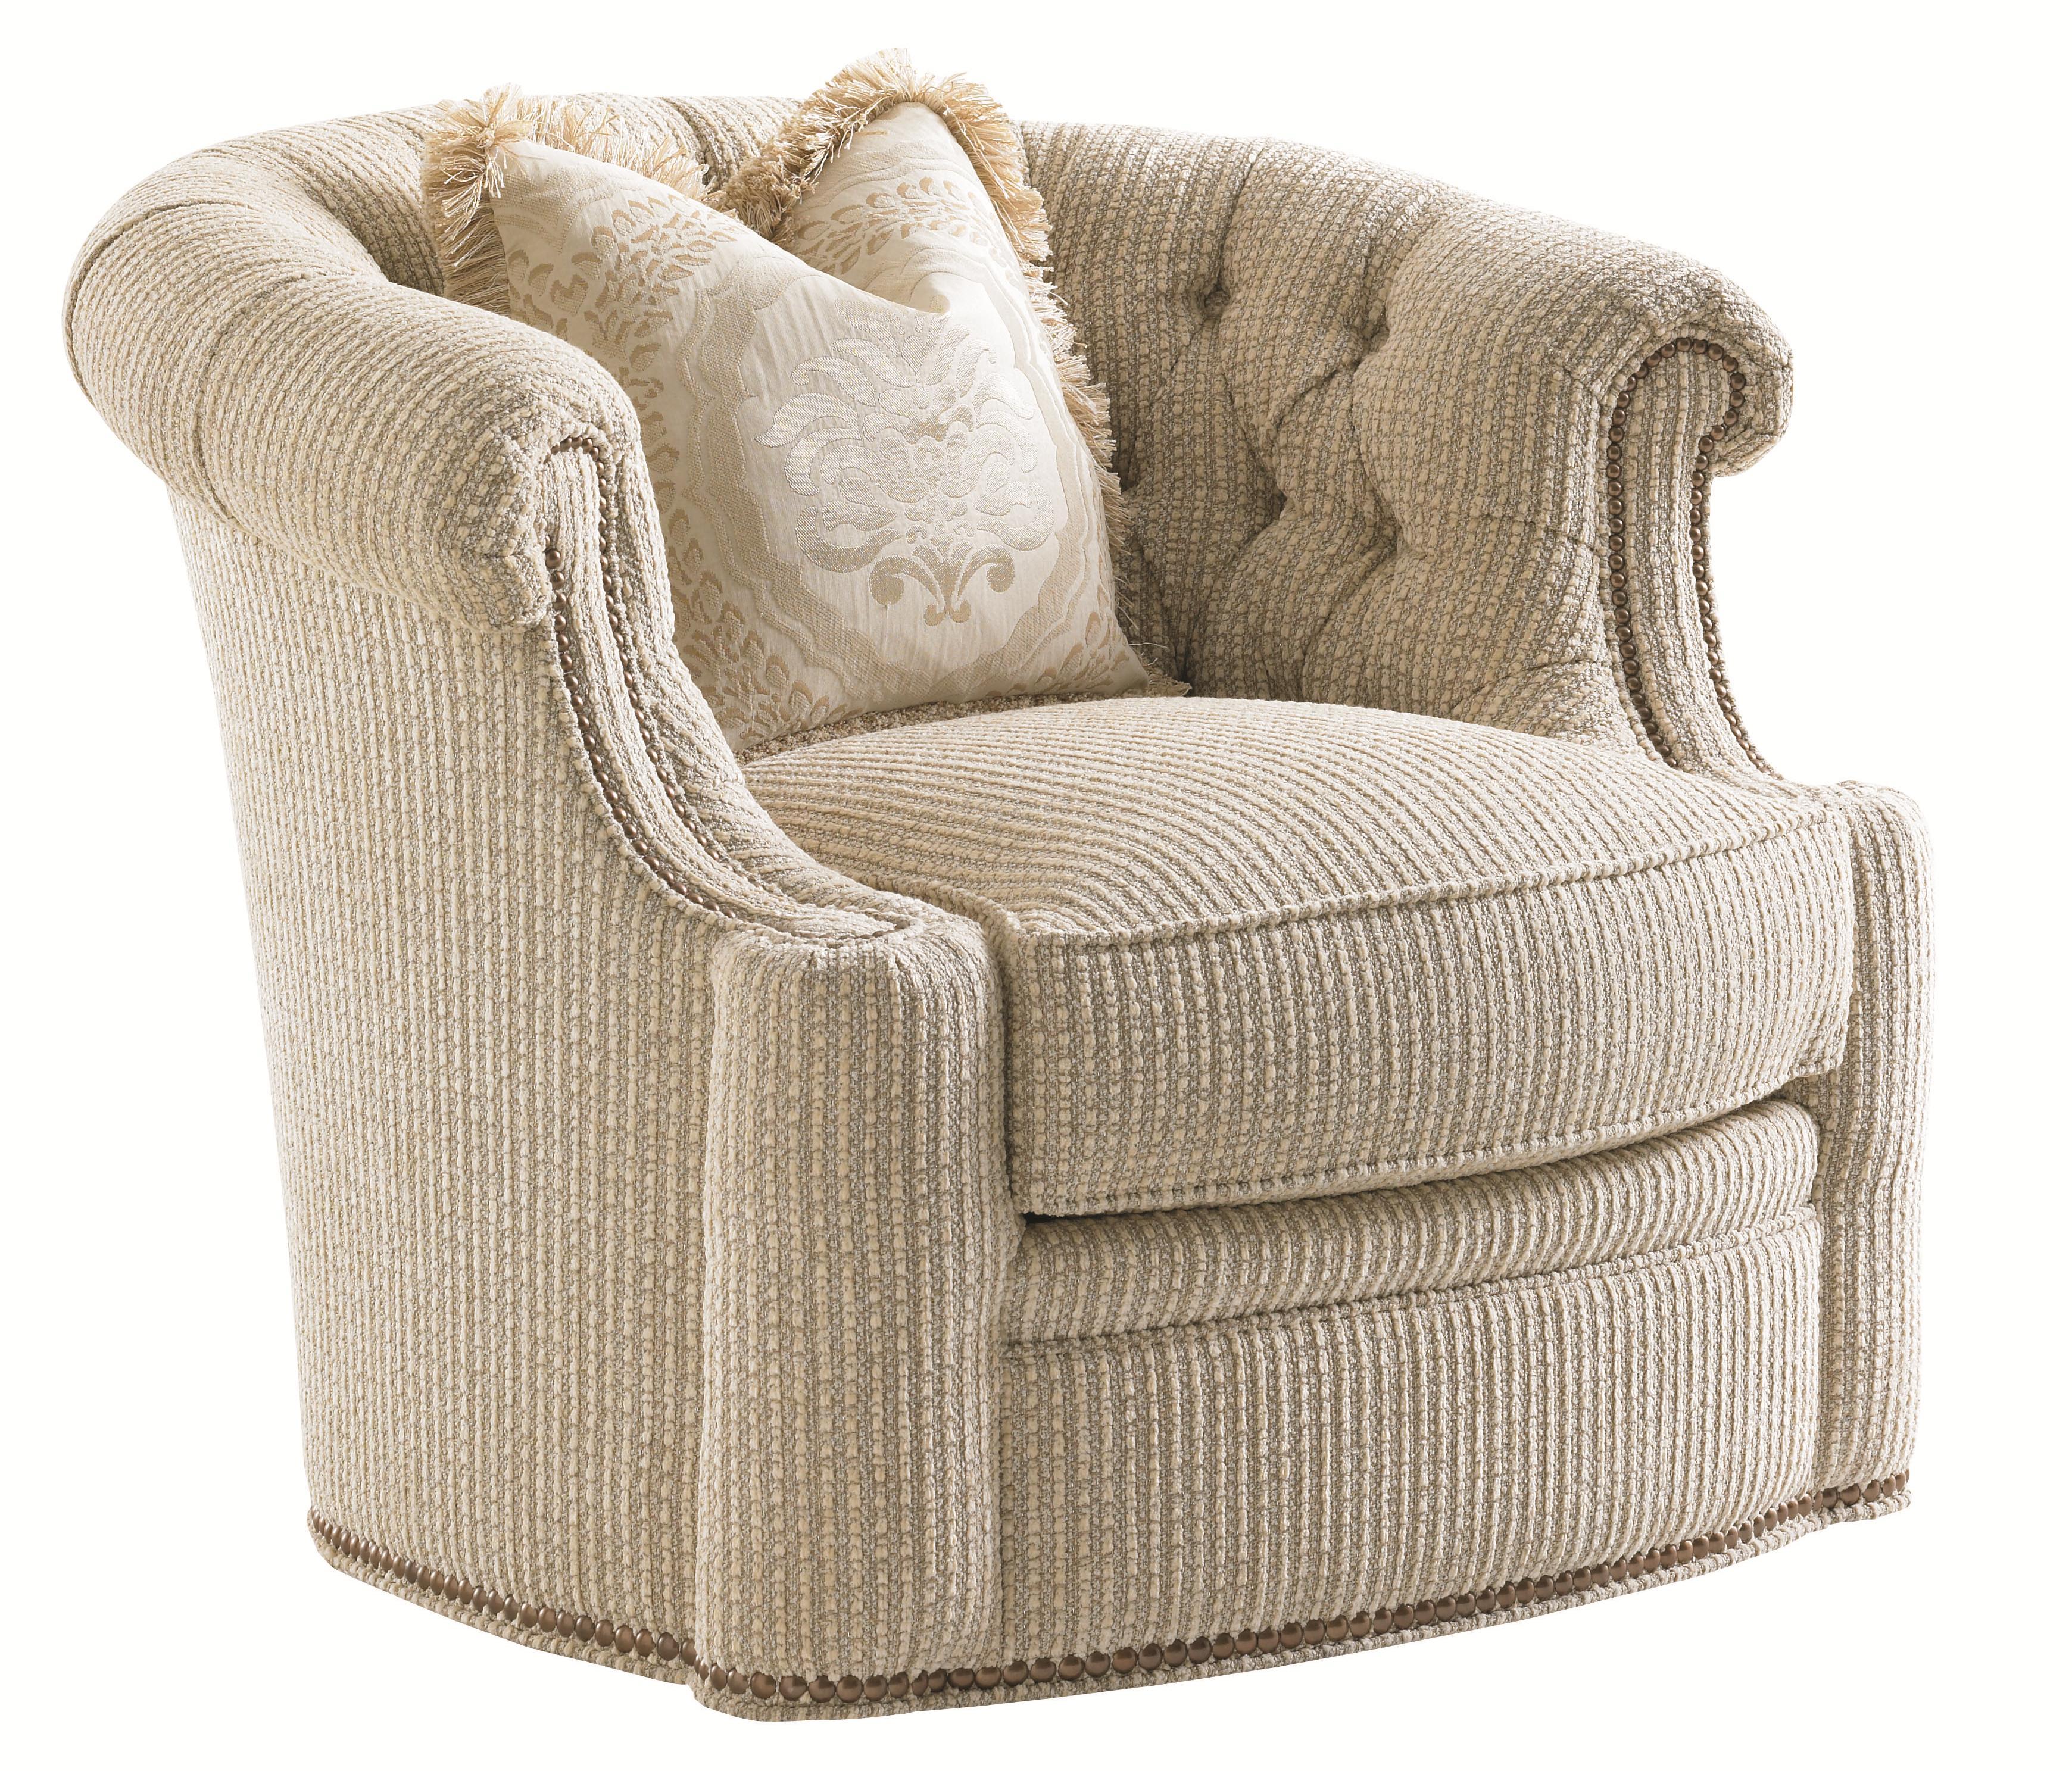 Florentino Feroni Swivel Chair by Lexington at Baer's Furniture